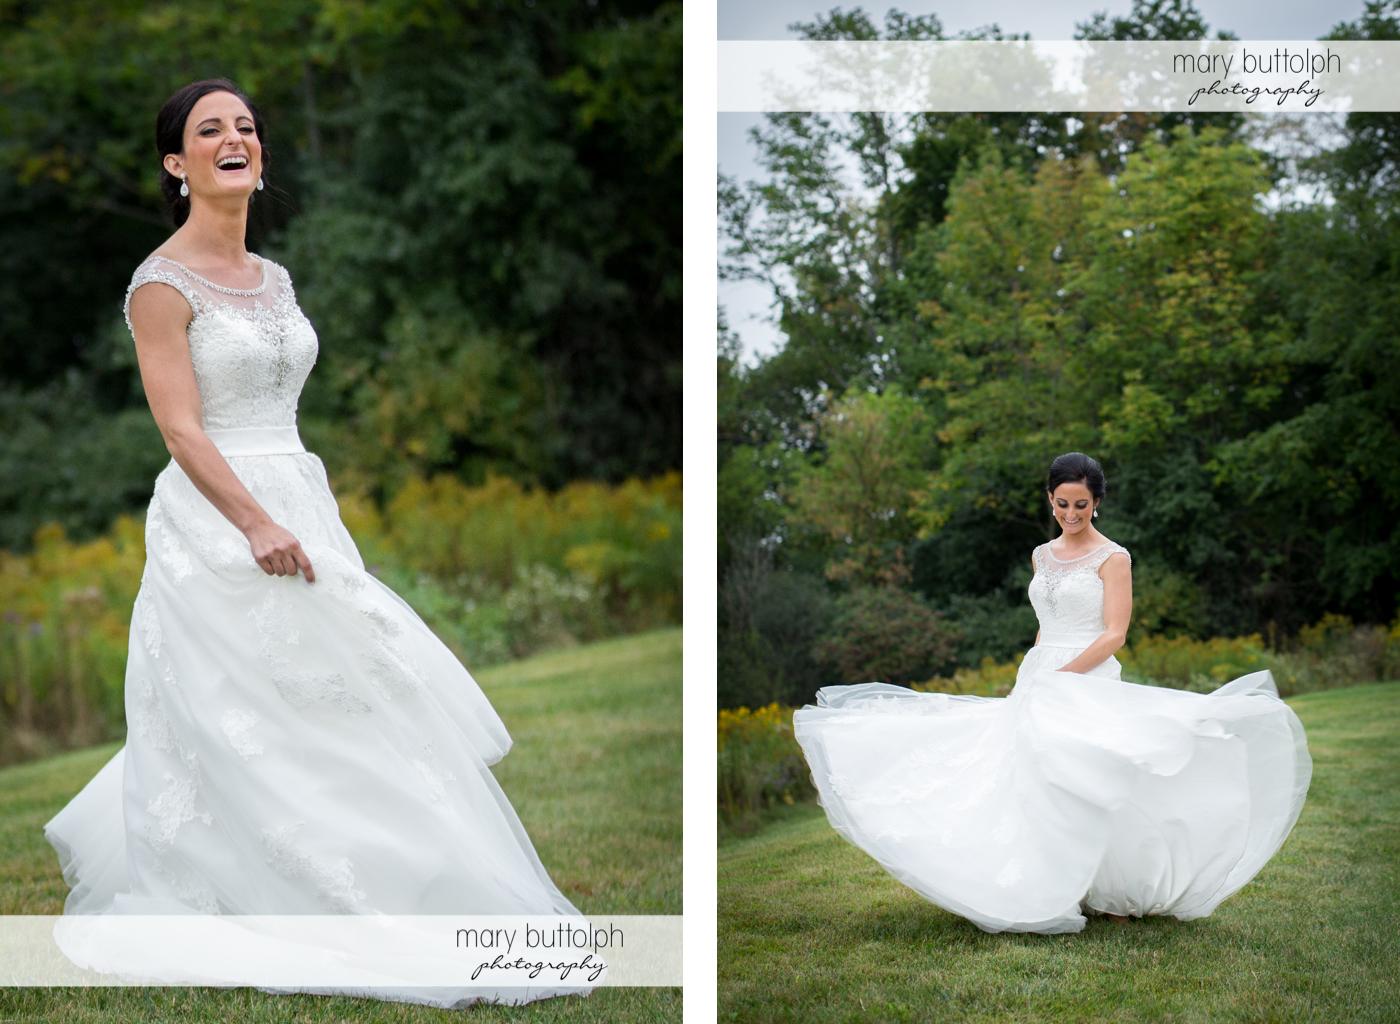 Bride shows her wedding dress in the garden at Anyela's Vineyards Wedding